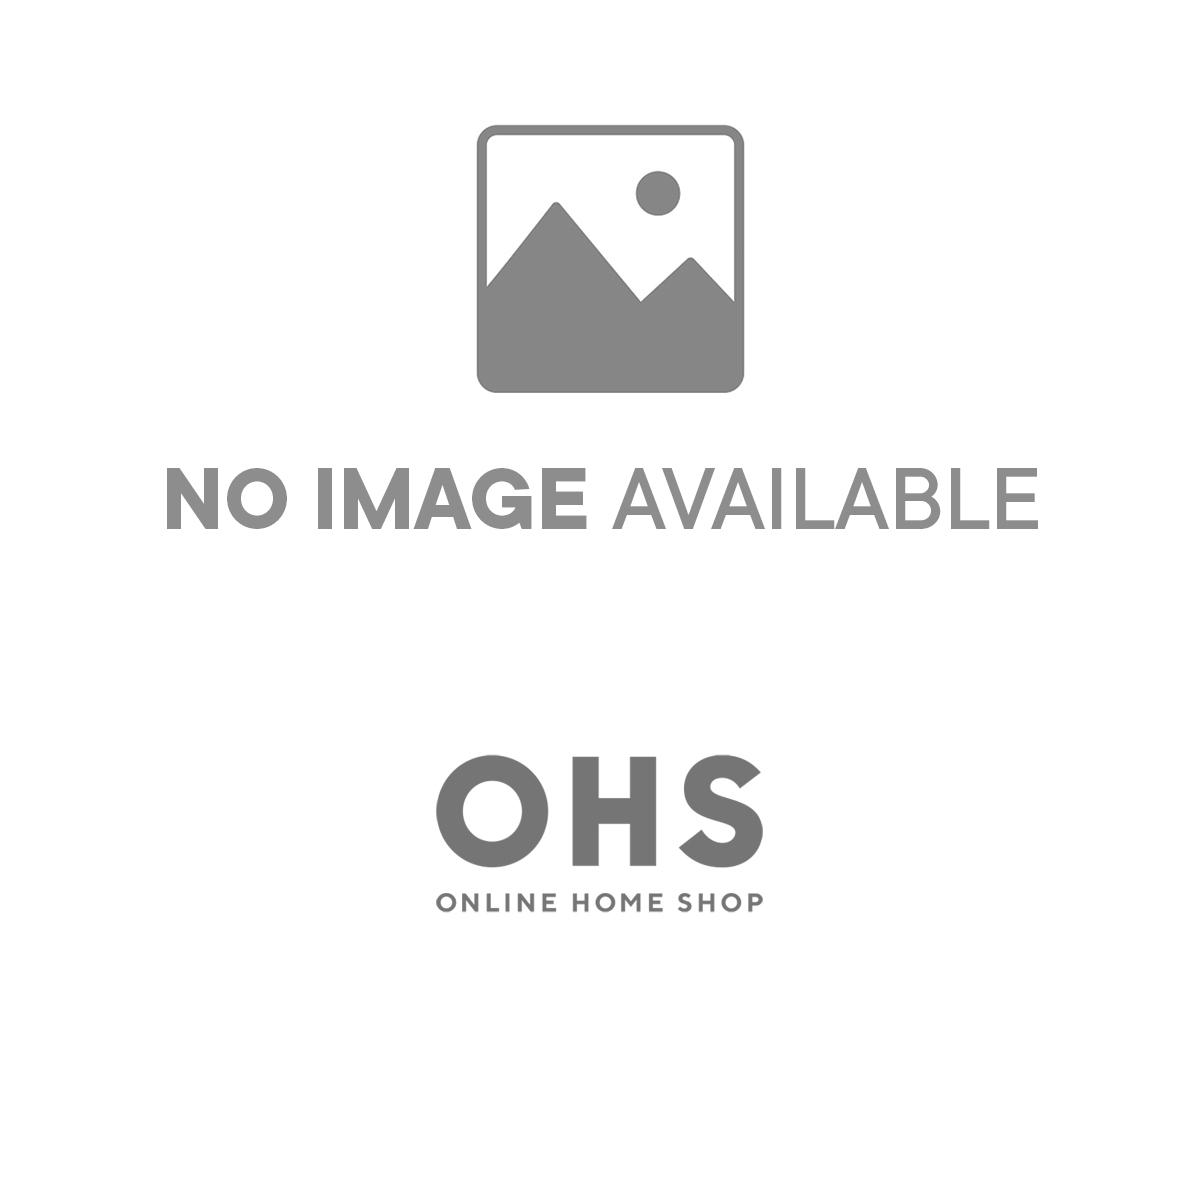 highams 100 brushed cotton flannelette fitted sheet white. Black Bedroom Furniture Sets. Home Design Ideas